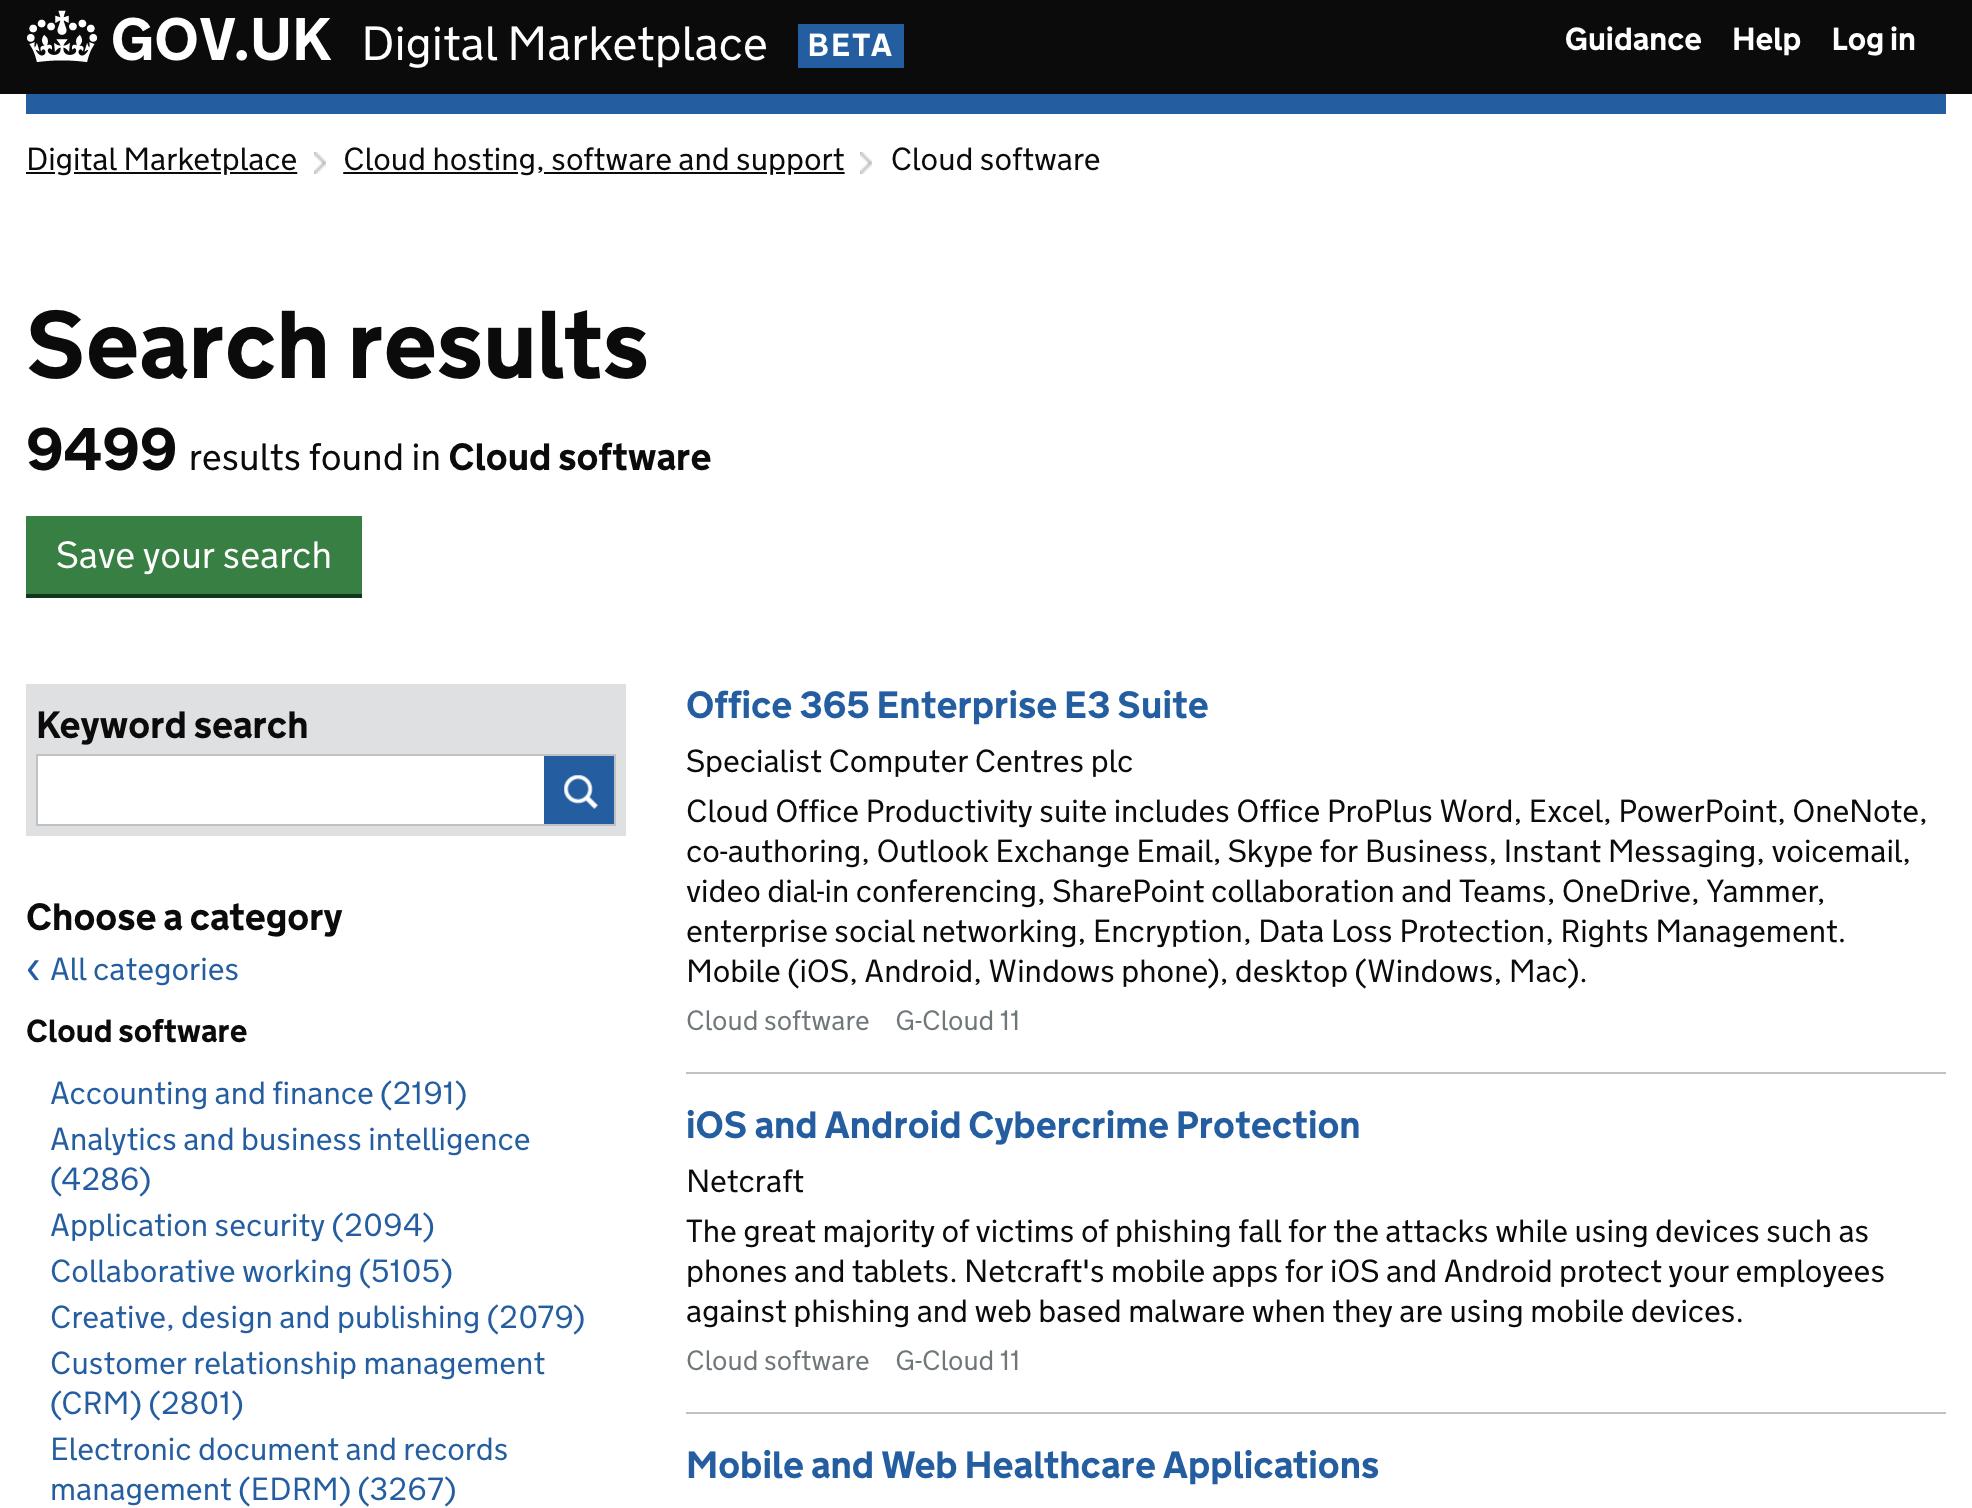 united Kingdom gov.uk site Digital Marketplace